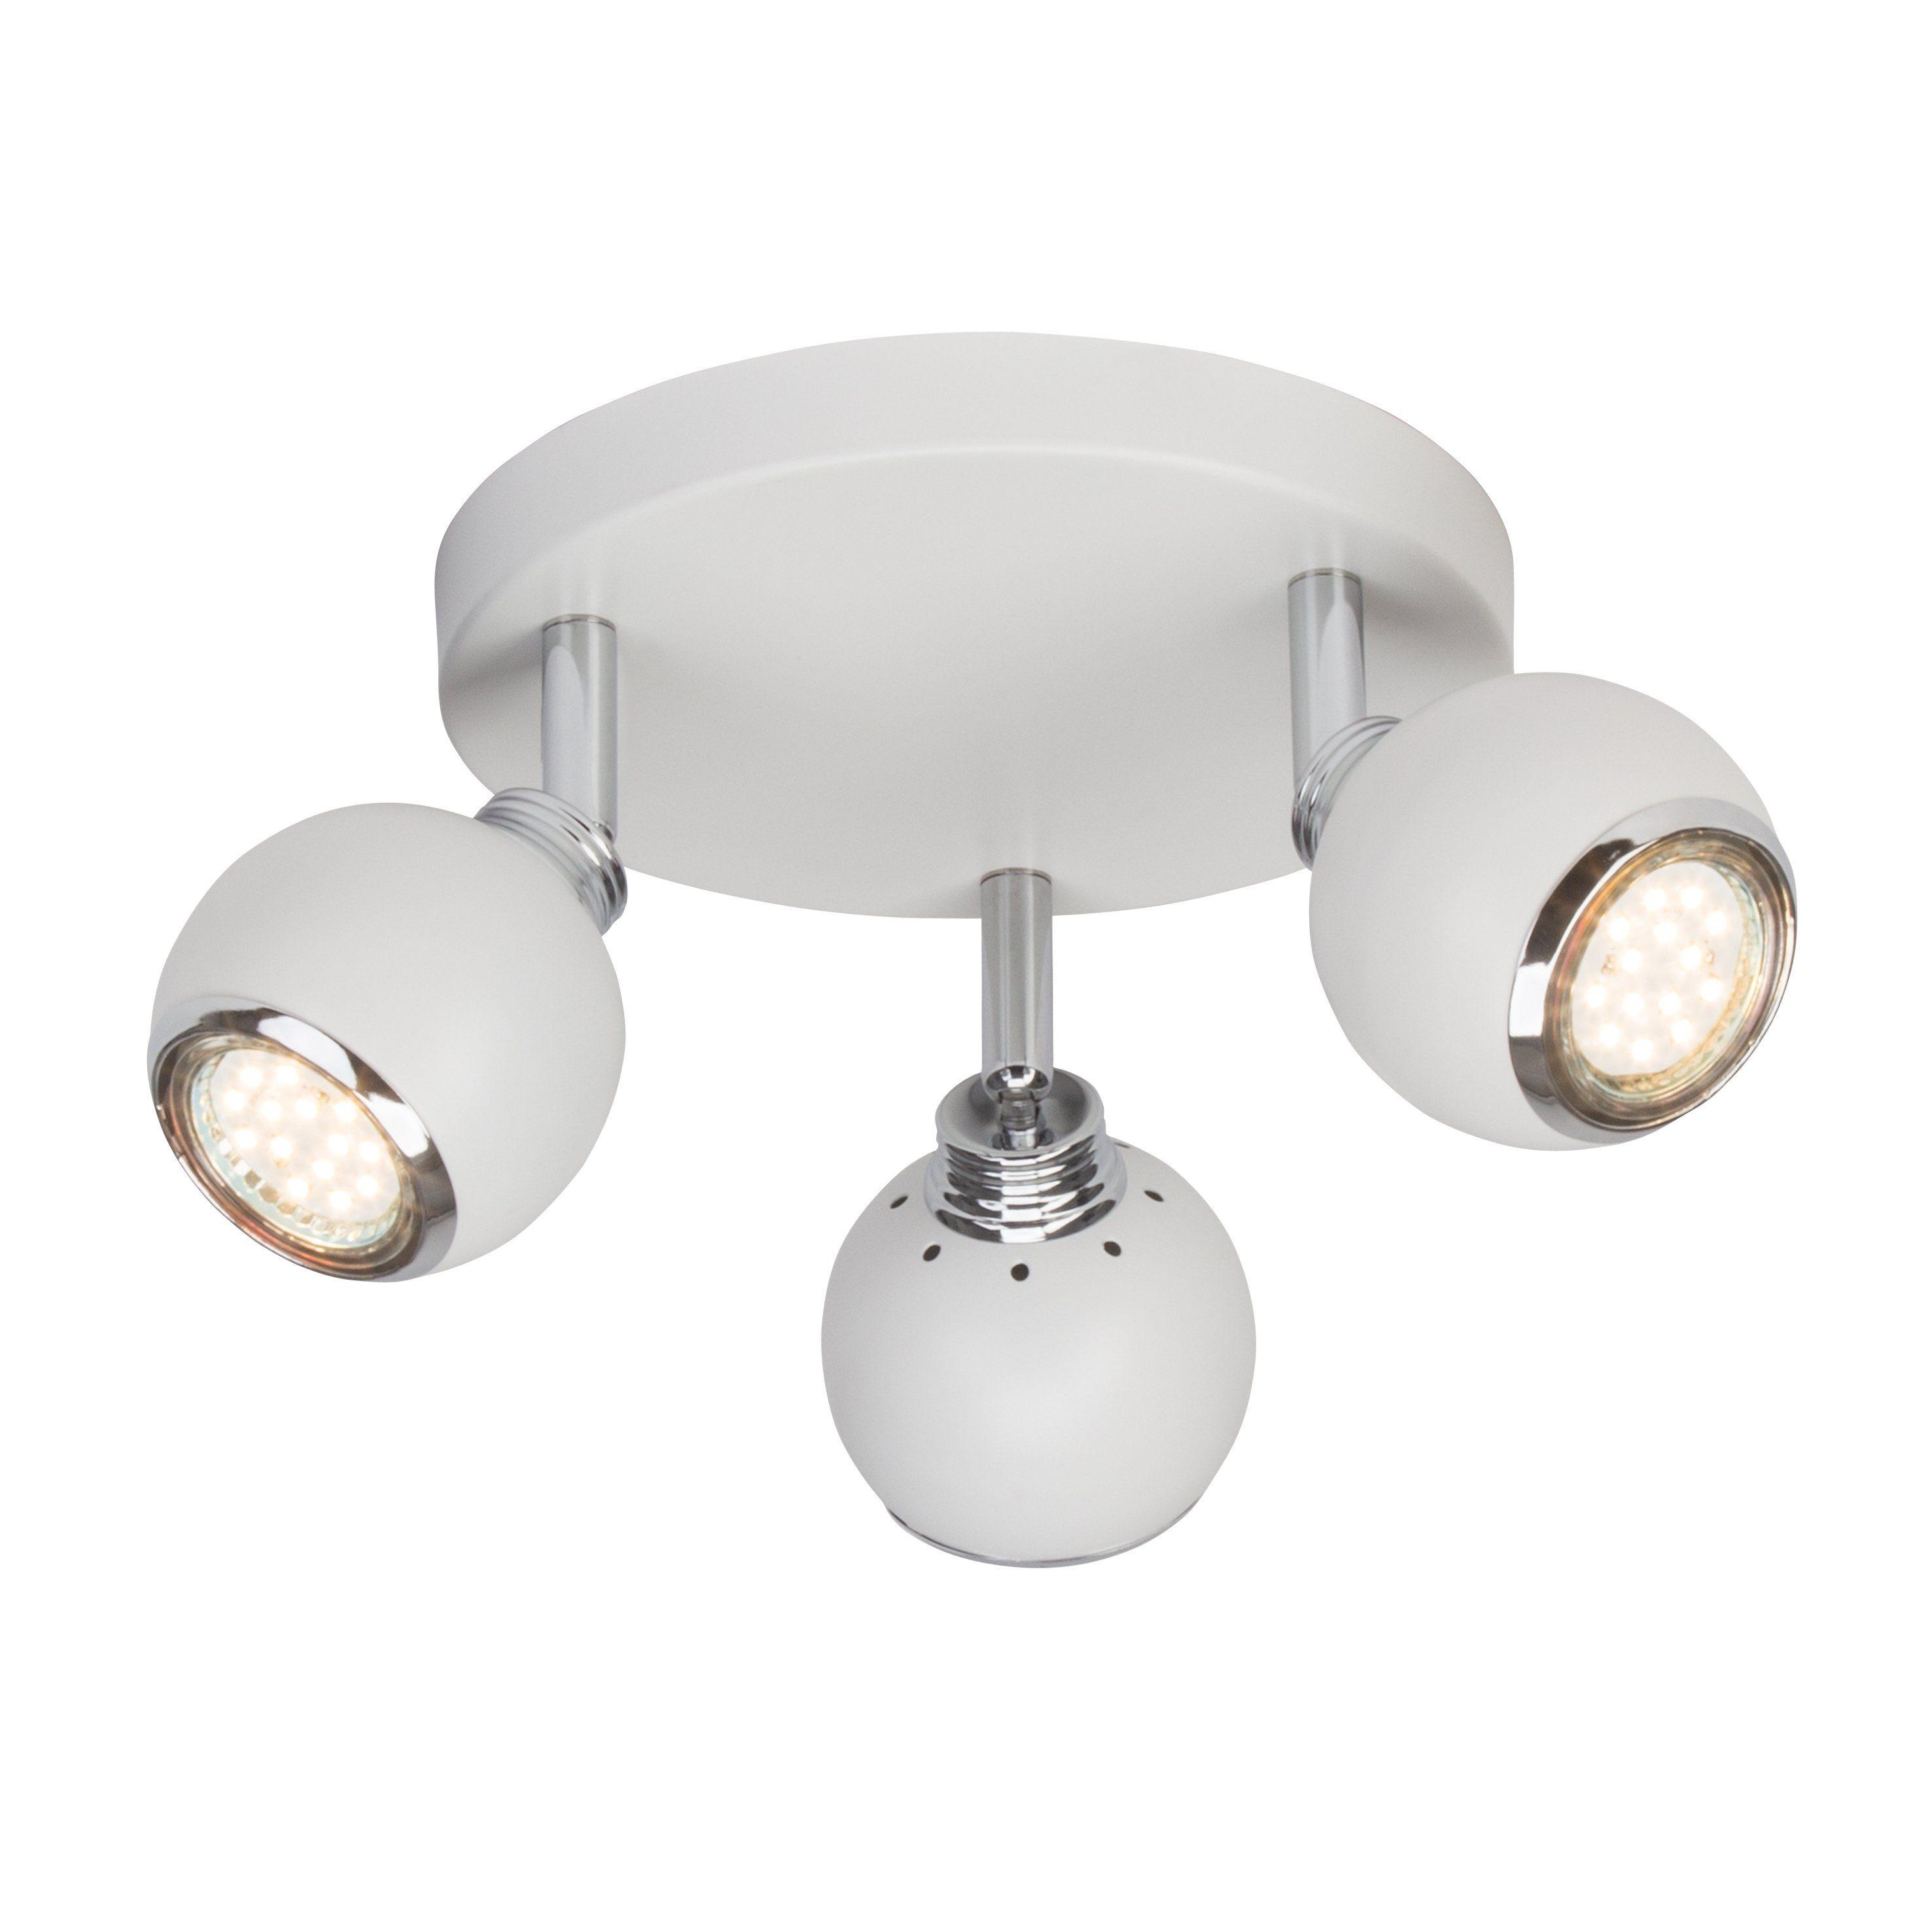 Brilliant Leuchten Ina LED Spotrondell, 3-flammig weiß/chrom